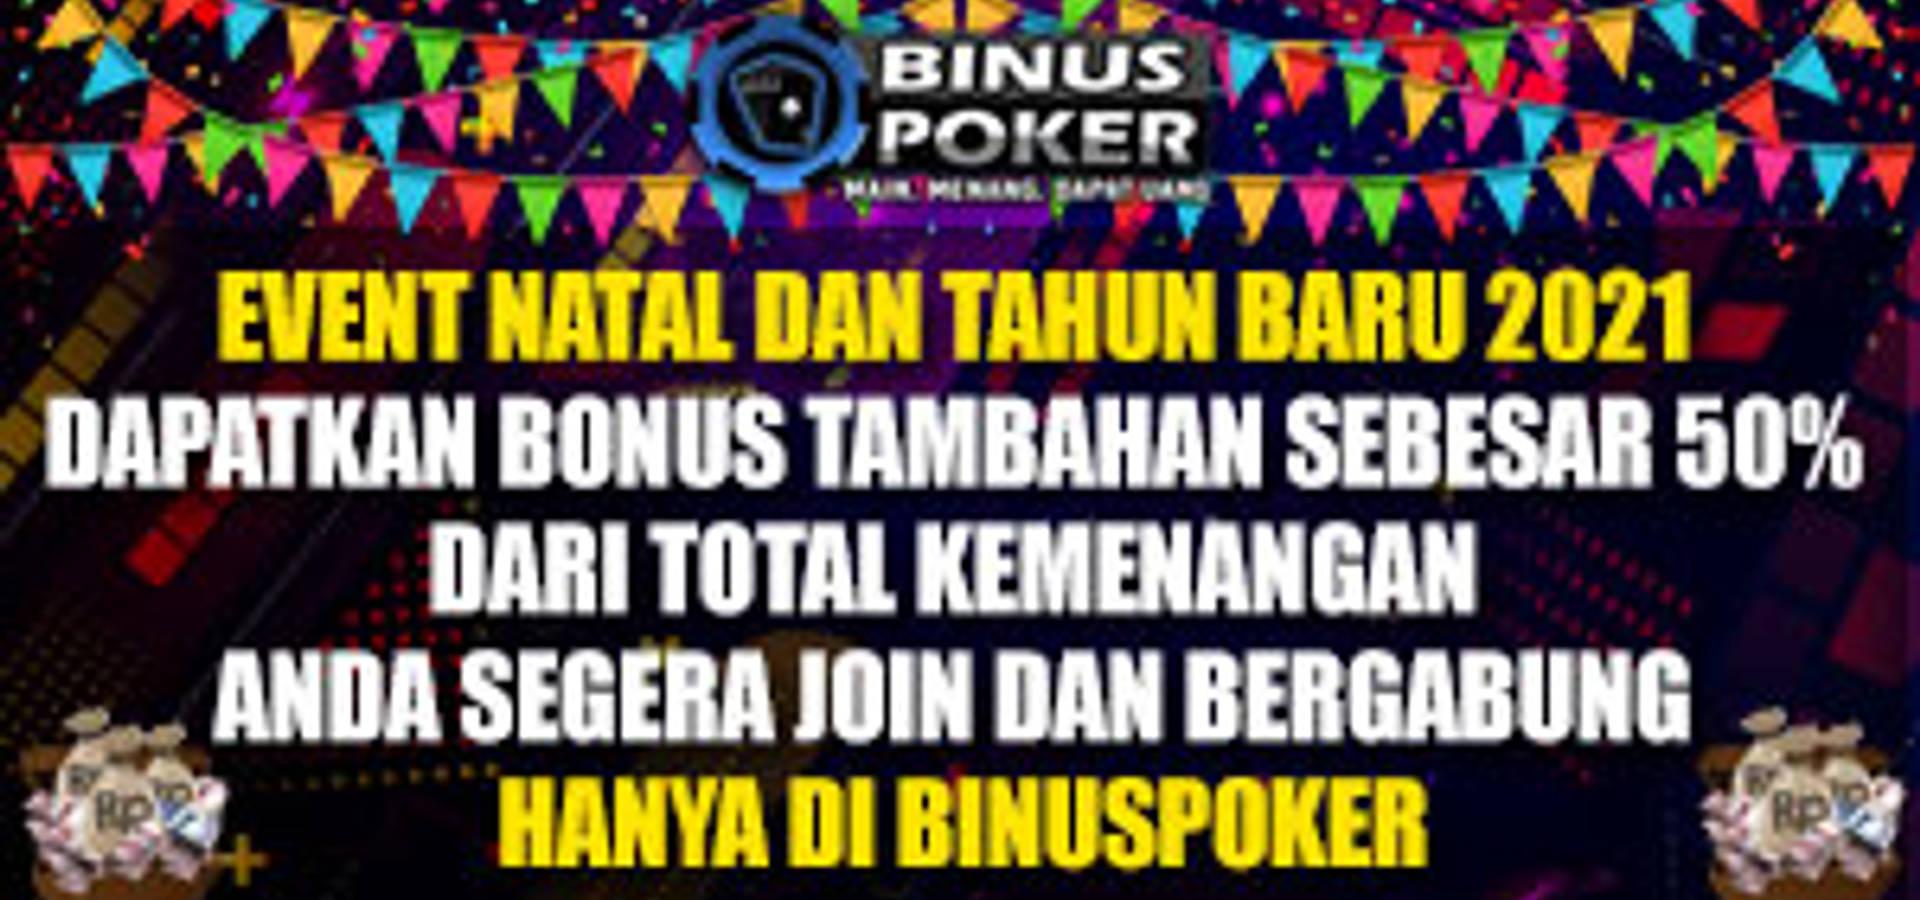 Daftar Situs Poker Terpercaya 2020 Daftar Poker Online Deposit Minimal 10 Ribu Homify